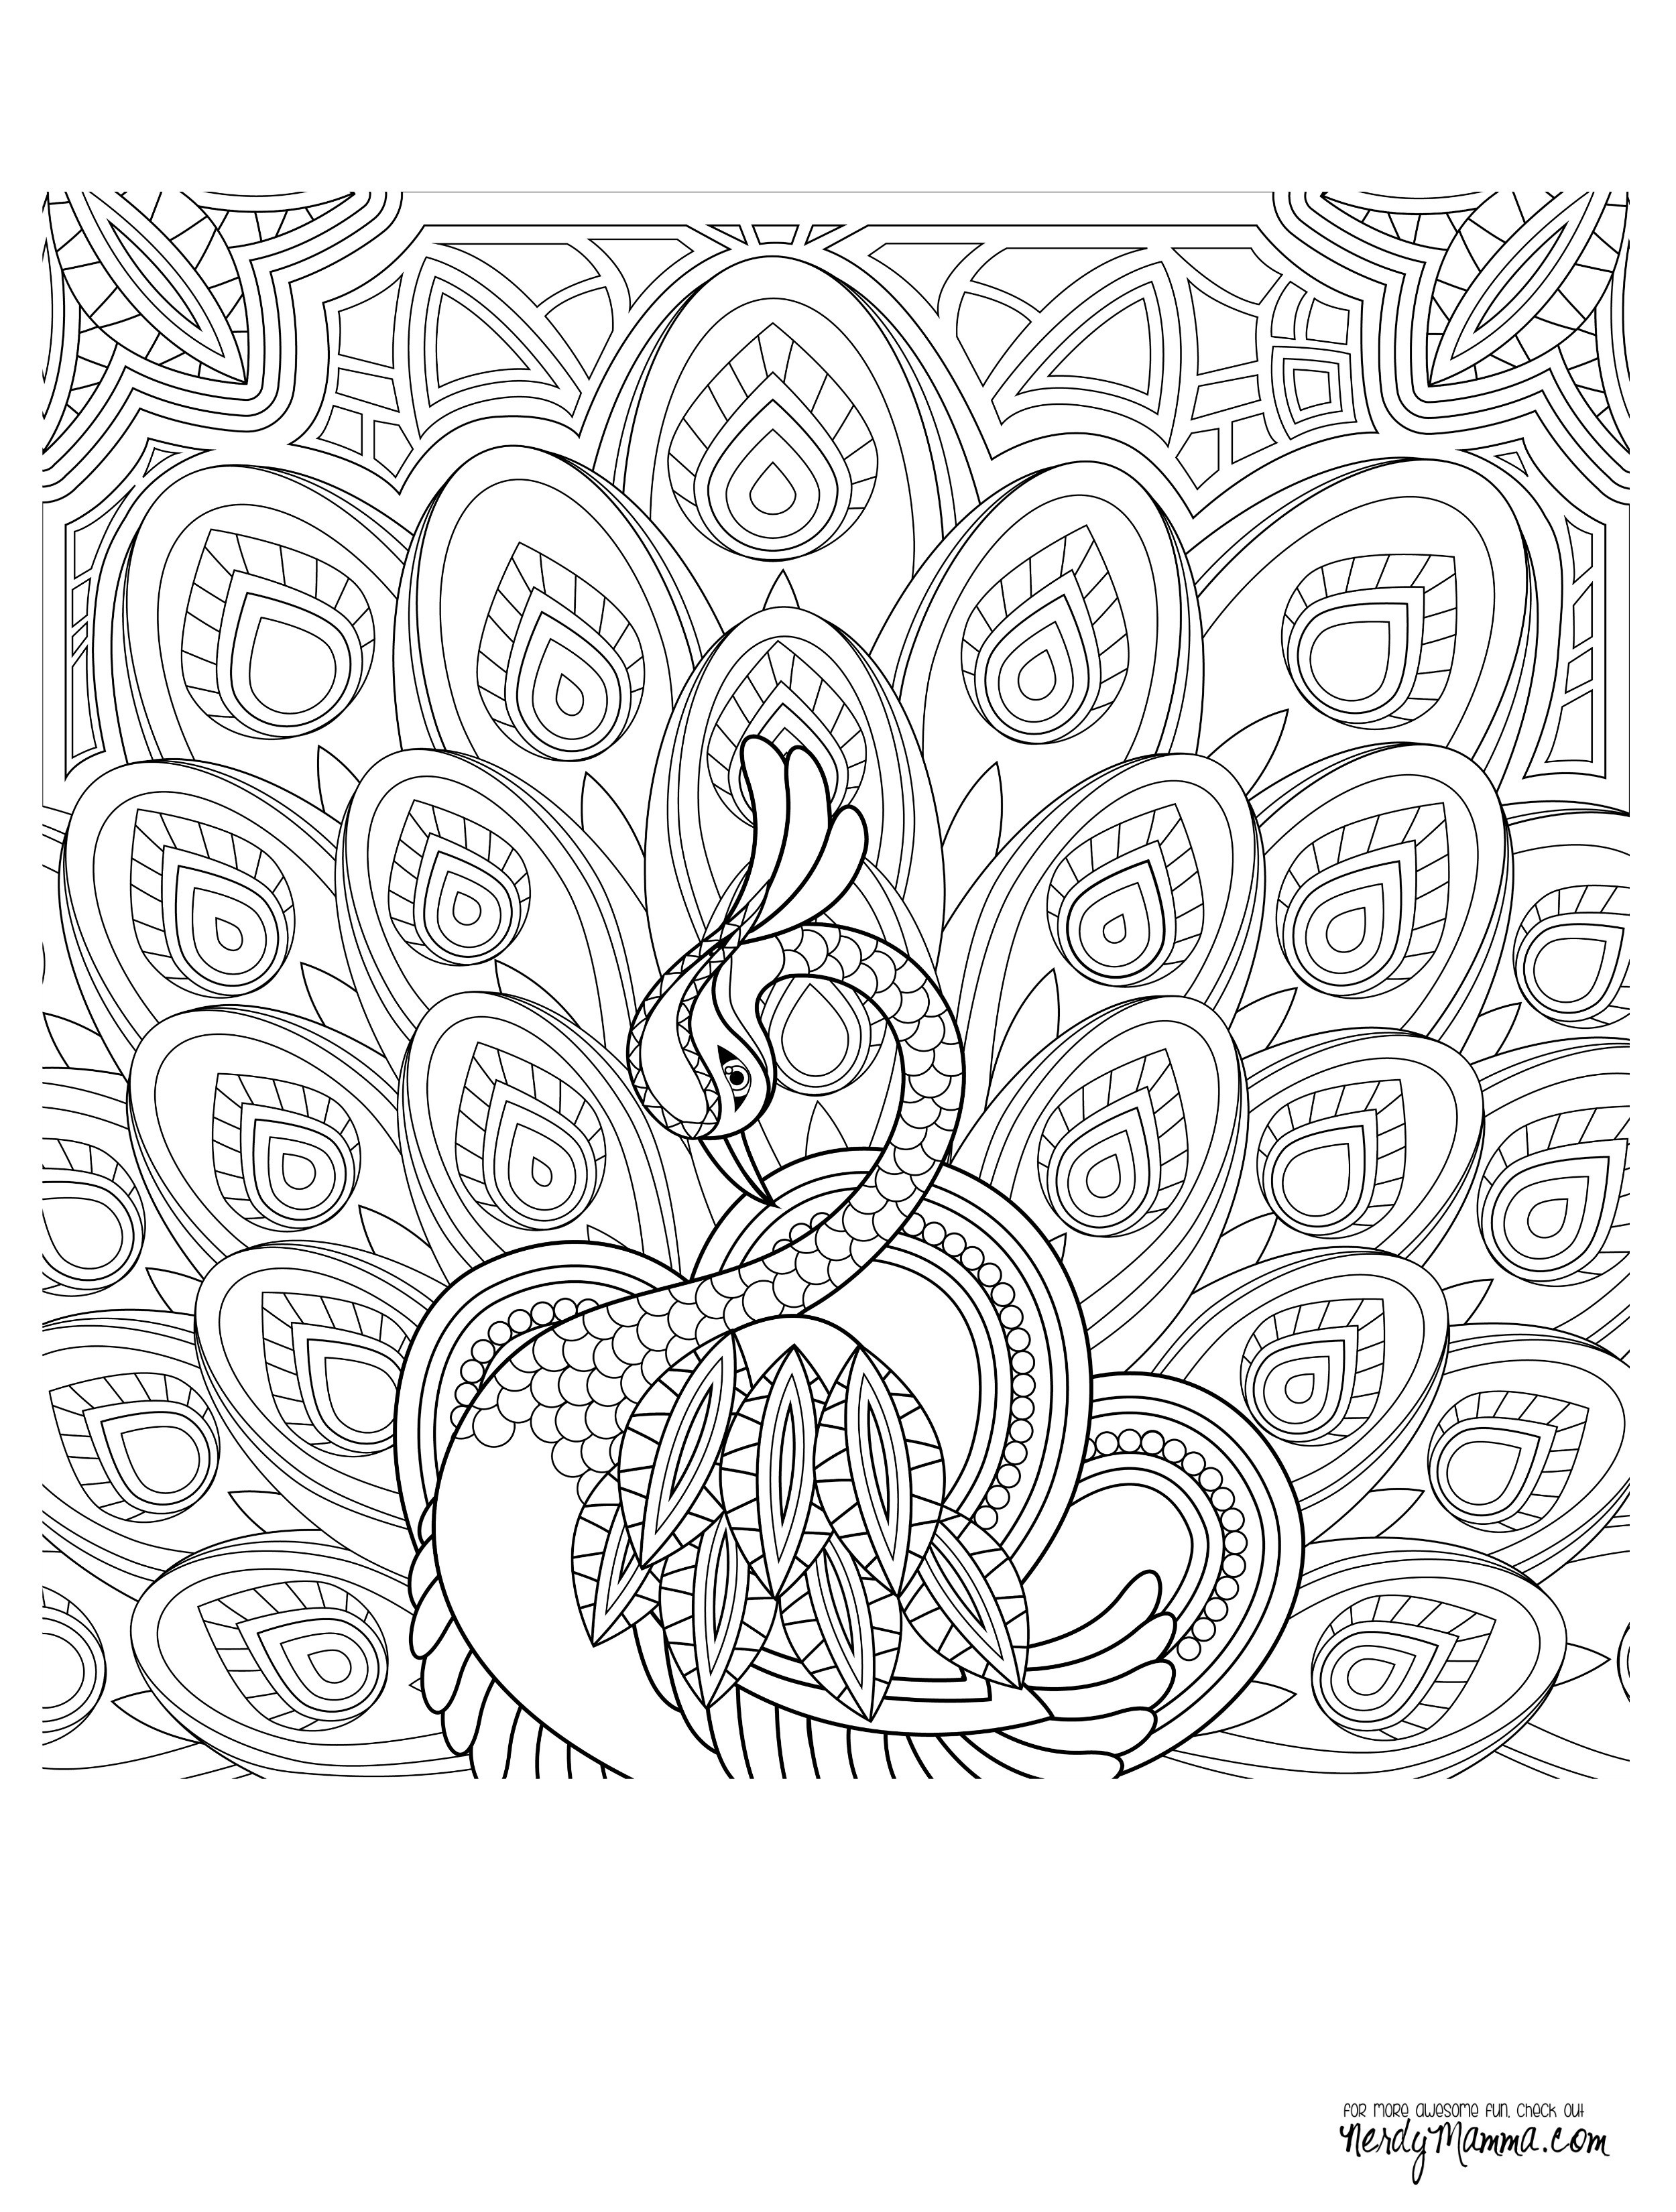 Rosen Bilder Zum Ausmalen Inspirierend 40 Elegant Ausmalbilder Mandala Rosen Mickeycarrollmunchkin Bilder